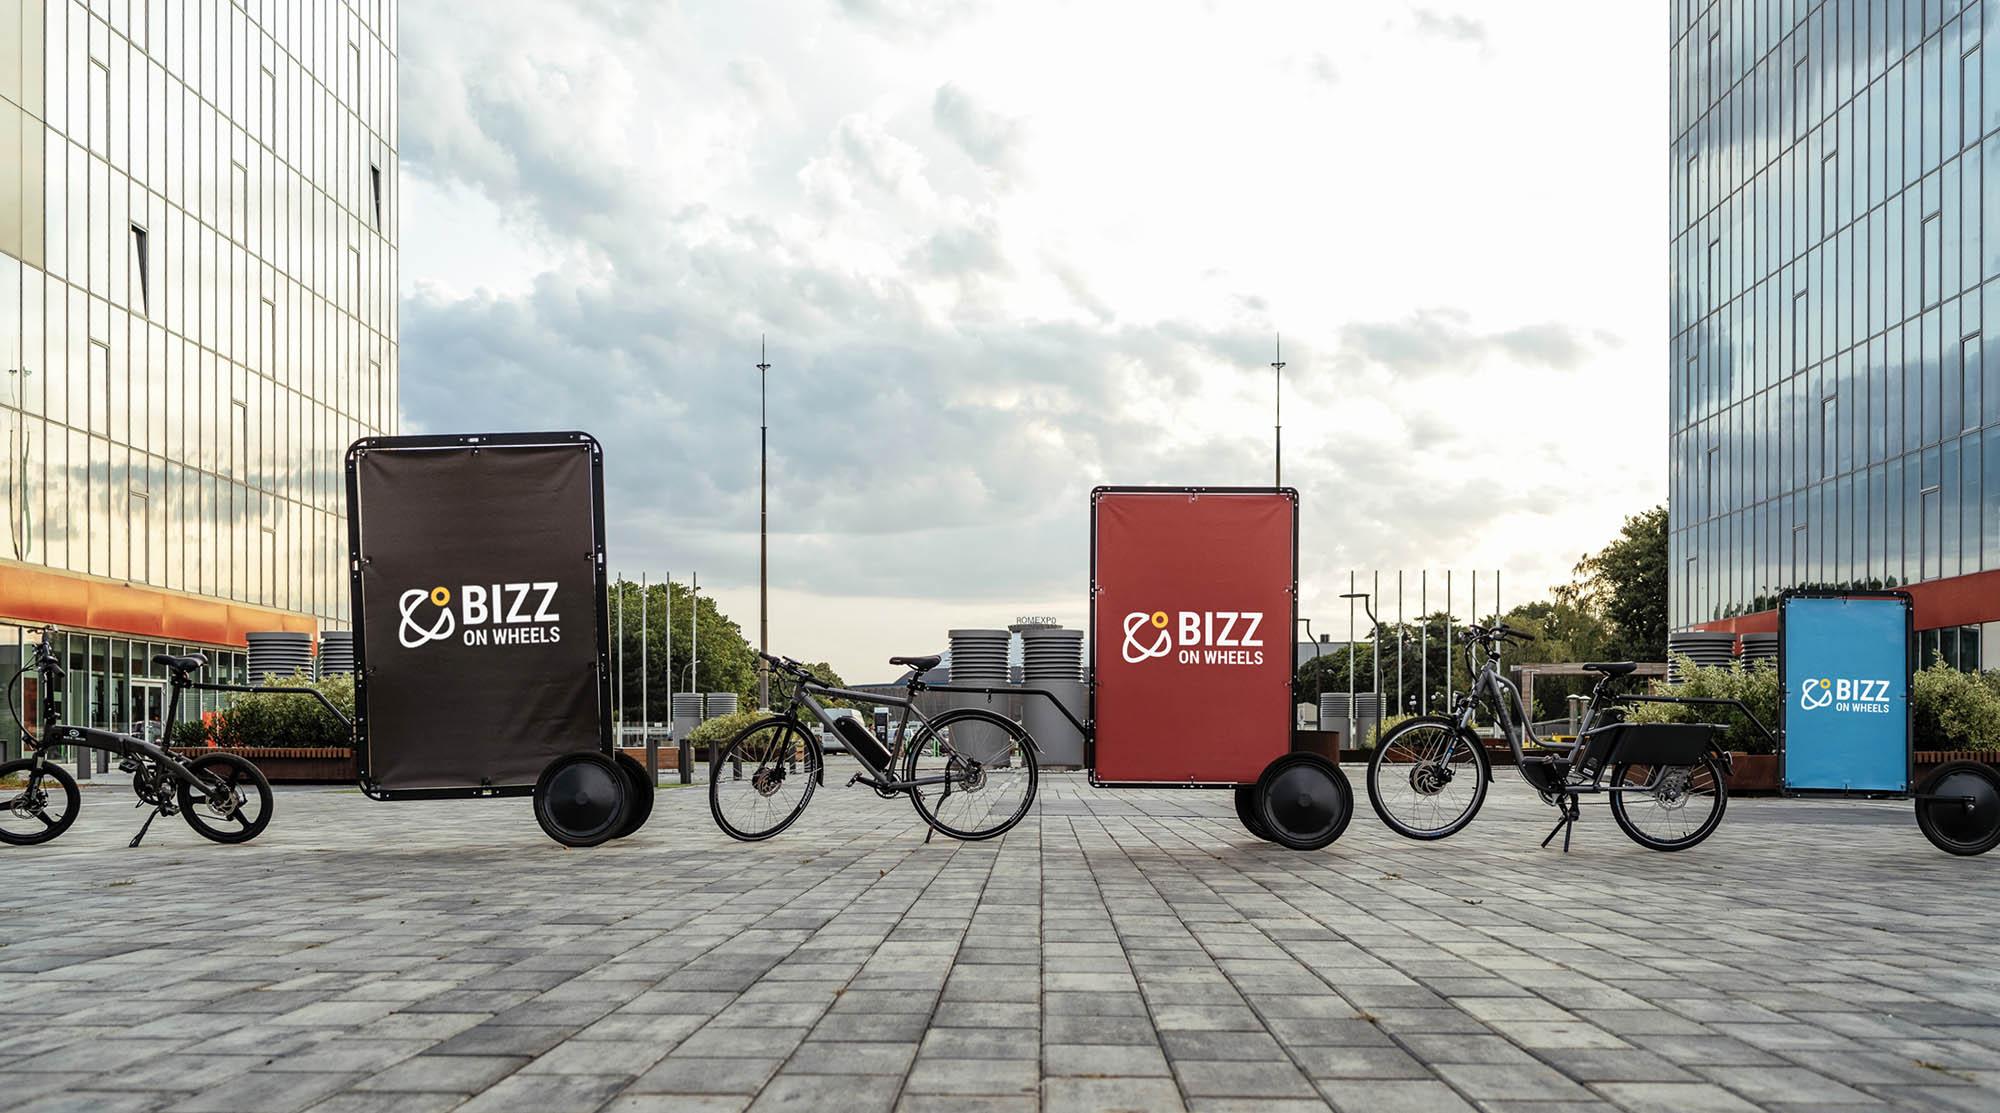 New AdBicy bike & mobile billboards range